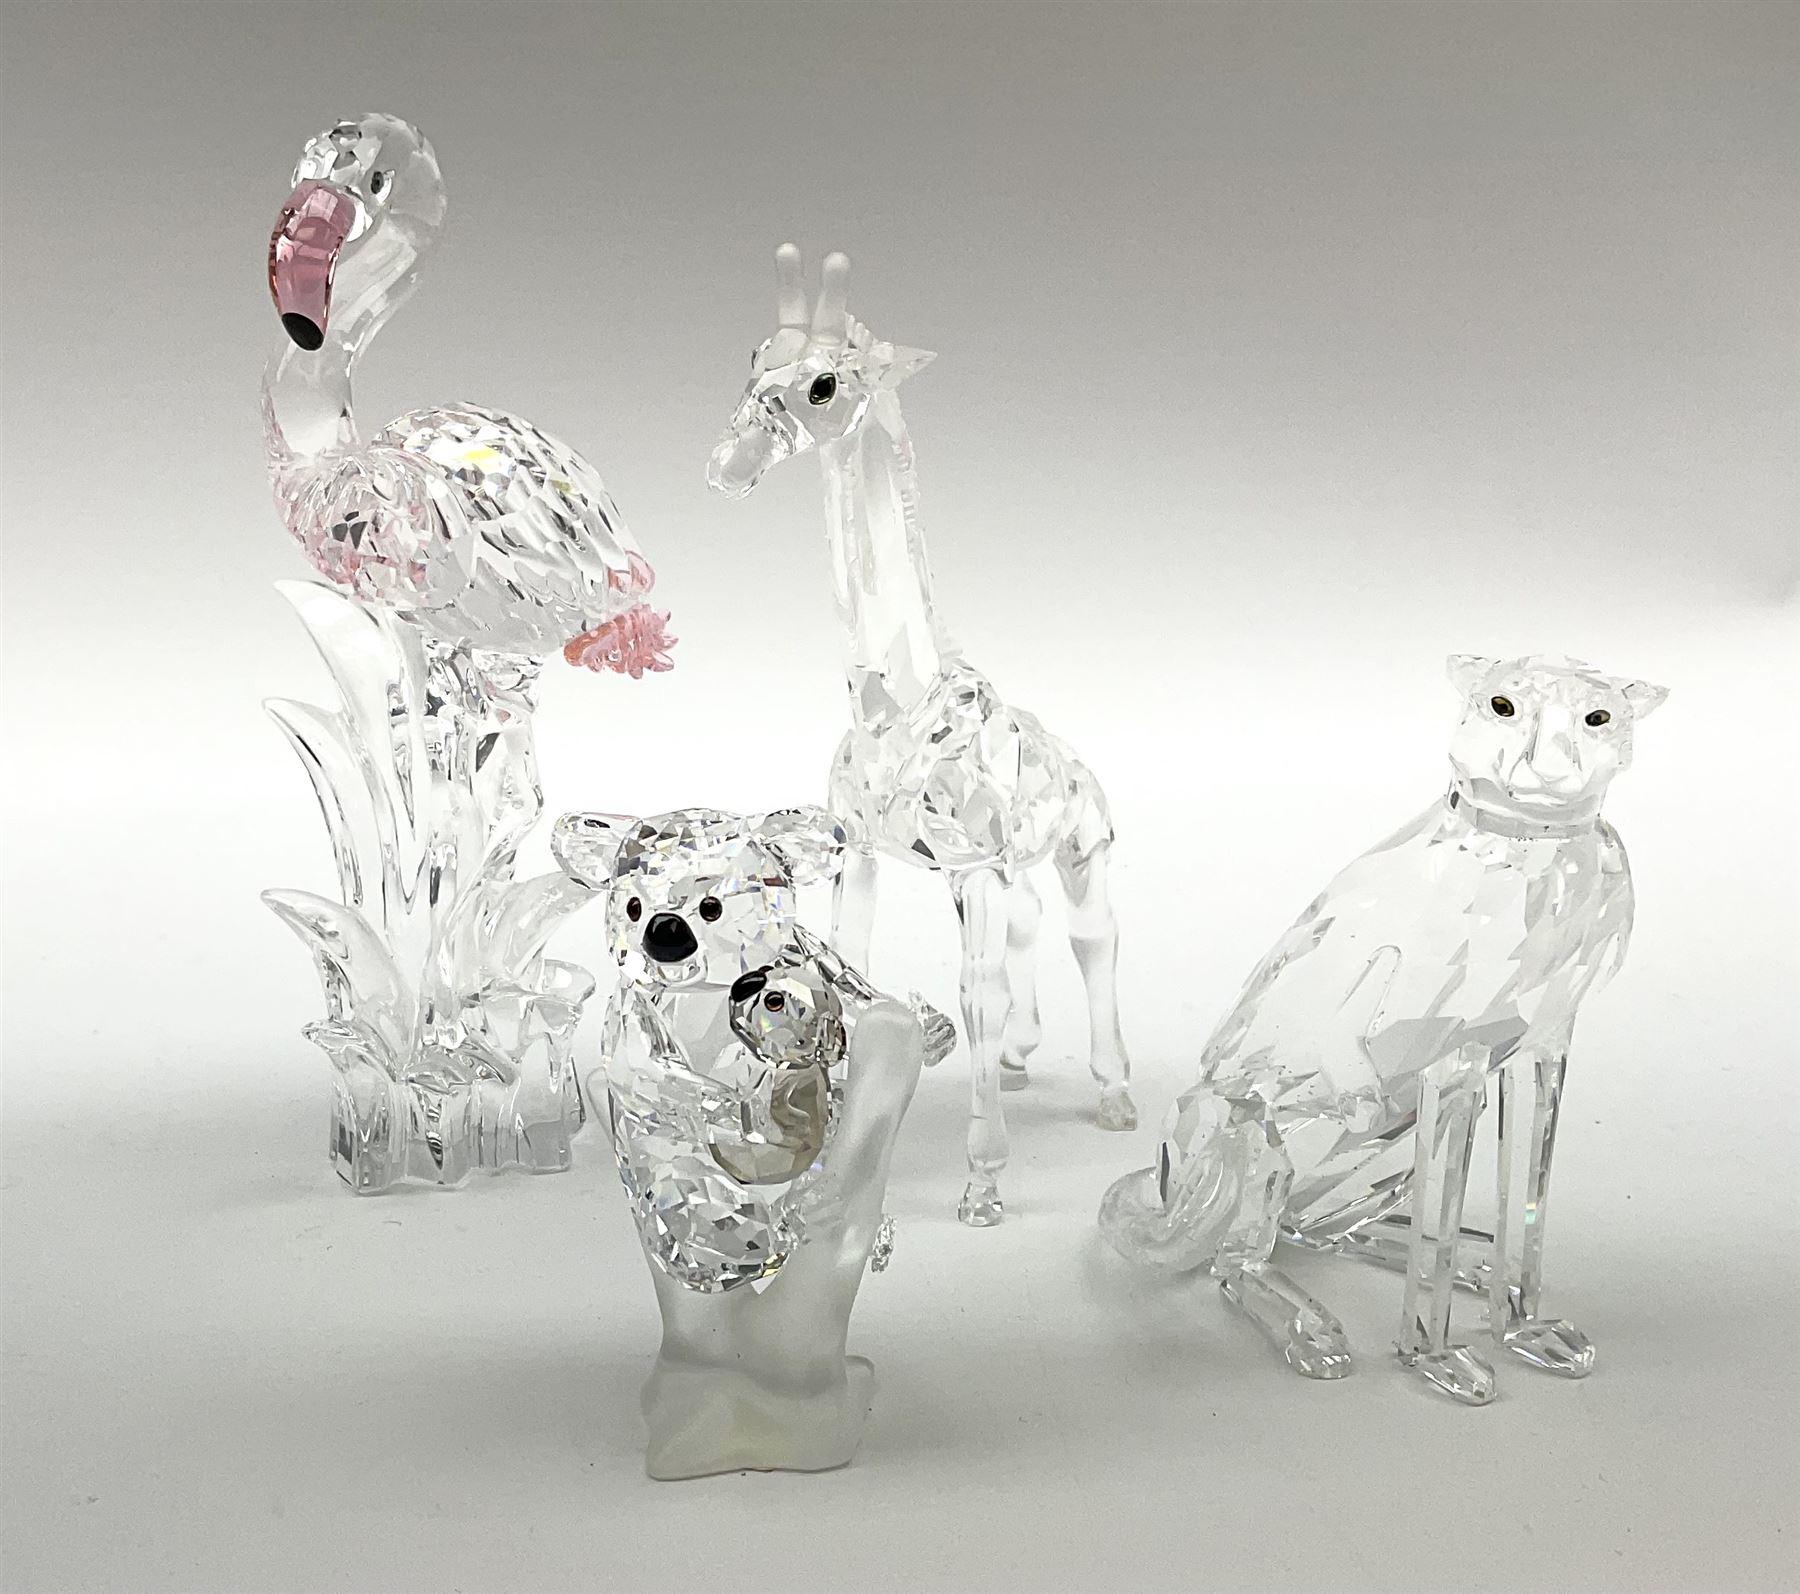 A group of four Swarovski Crystal figures